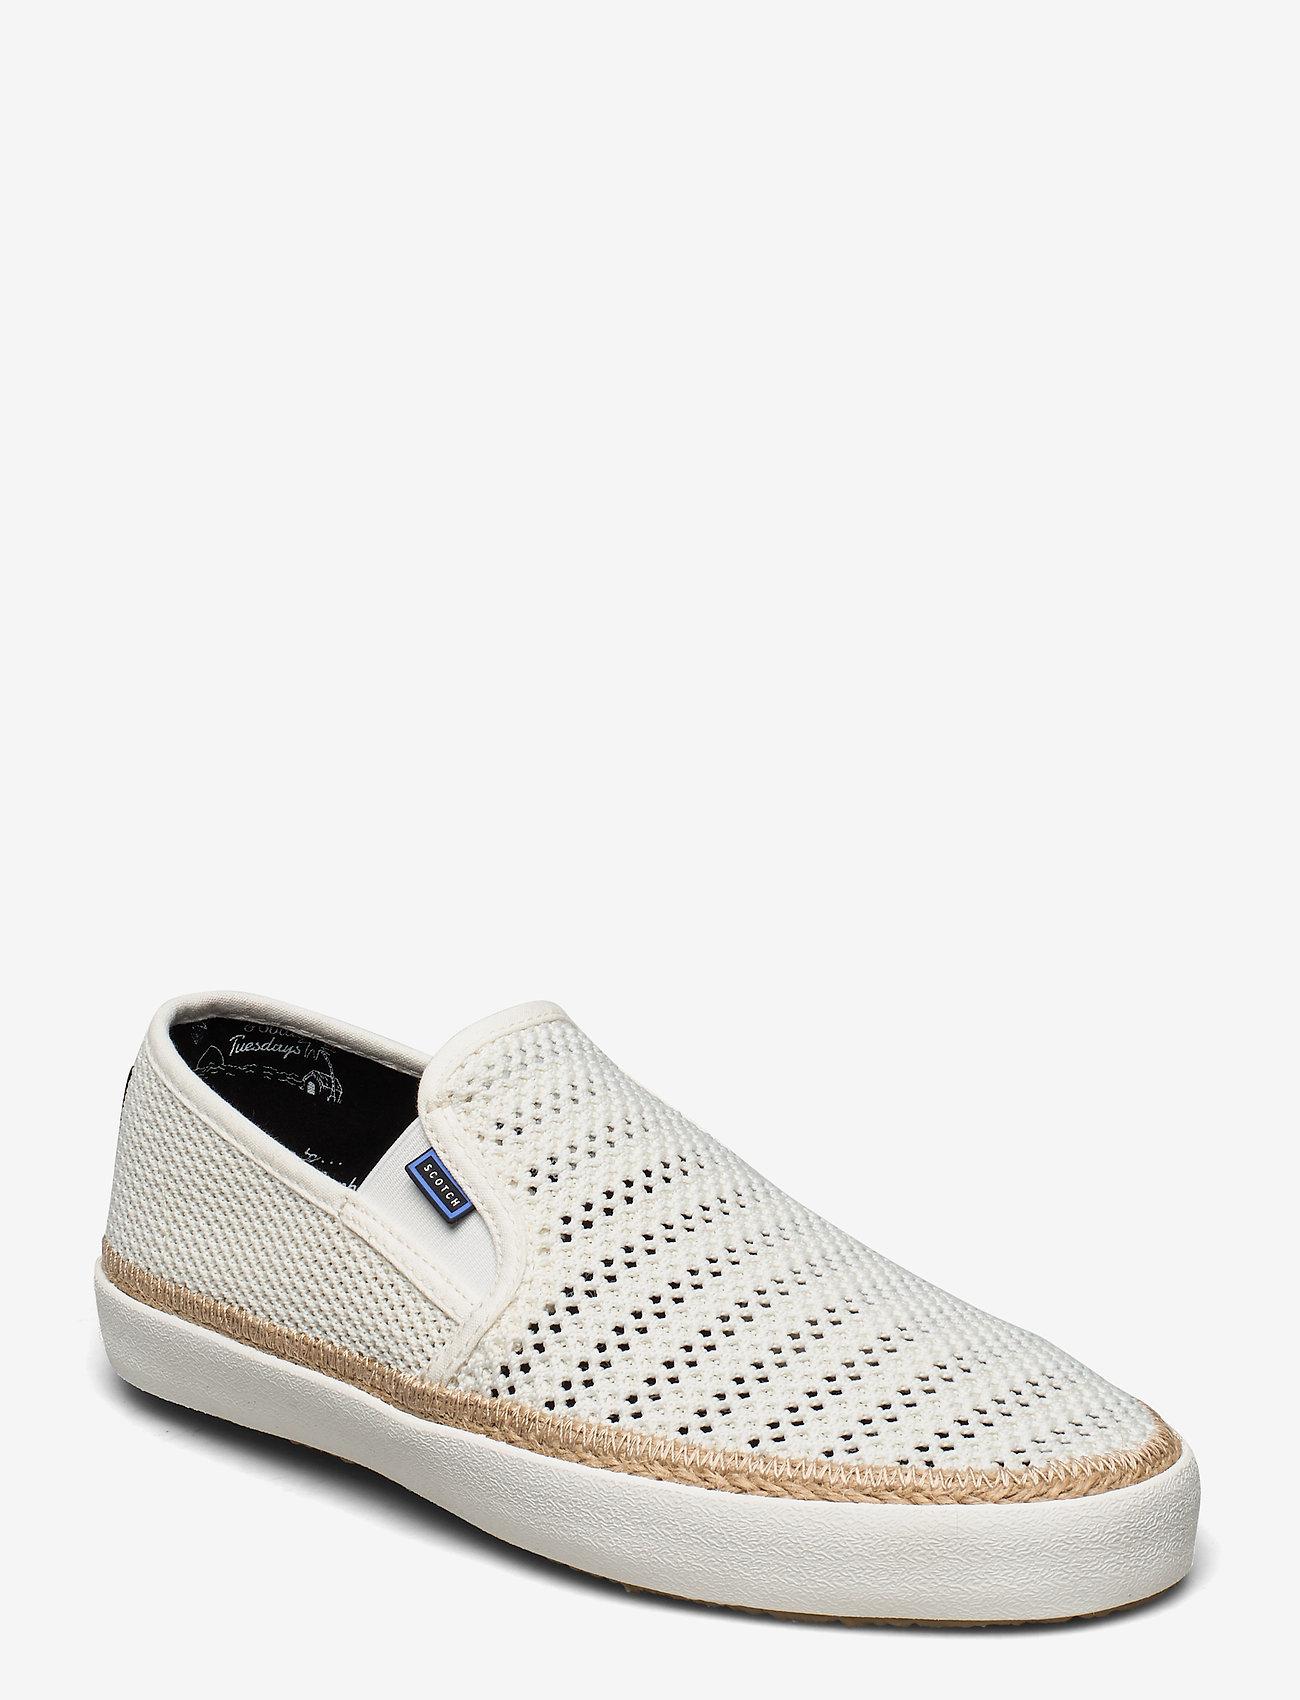 Scotch & Soda Shoes - Izomi Slip-on shoes - baskets slip-ons - off white - 0